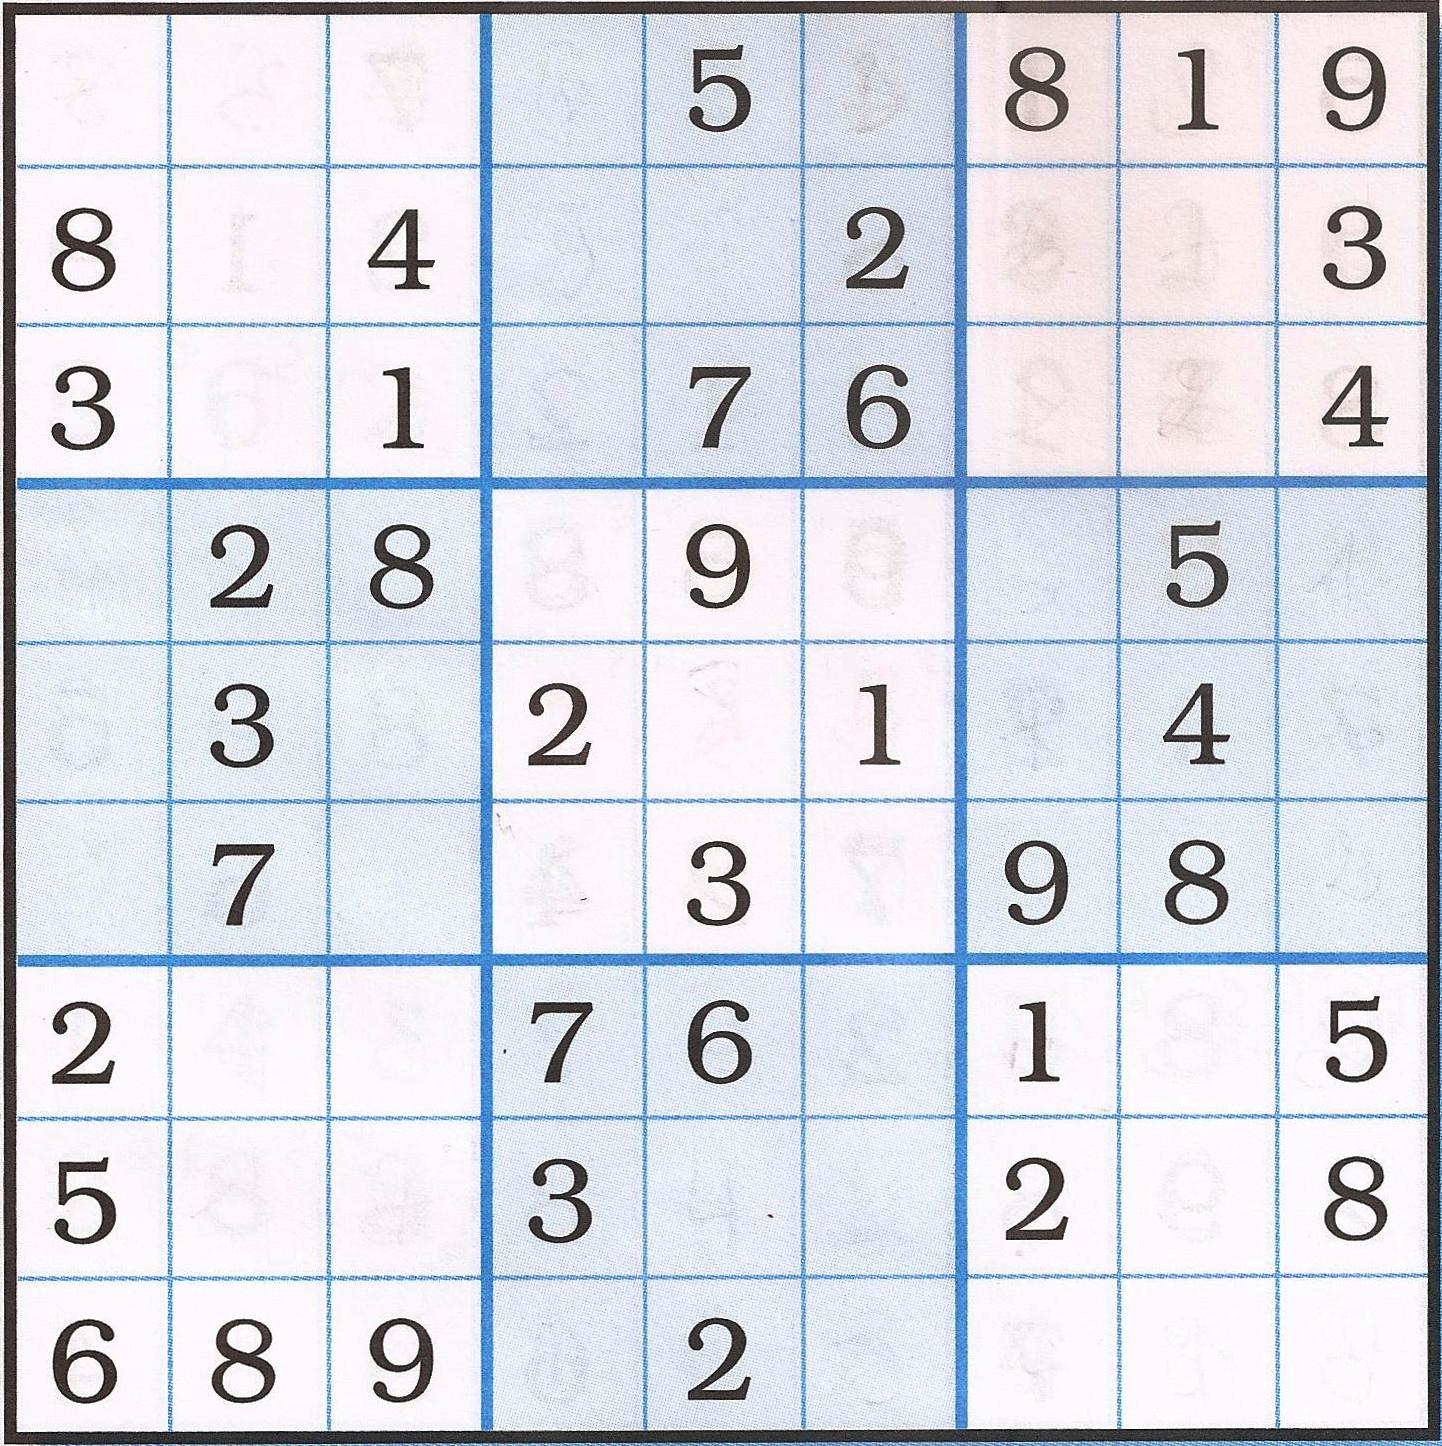 Sudoku – Facile – Le Veni, Vidi, Vinci avec Sudoku Facile Avec Solution